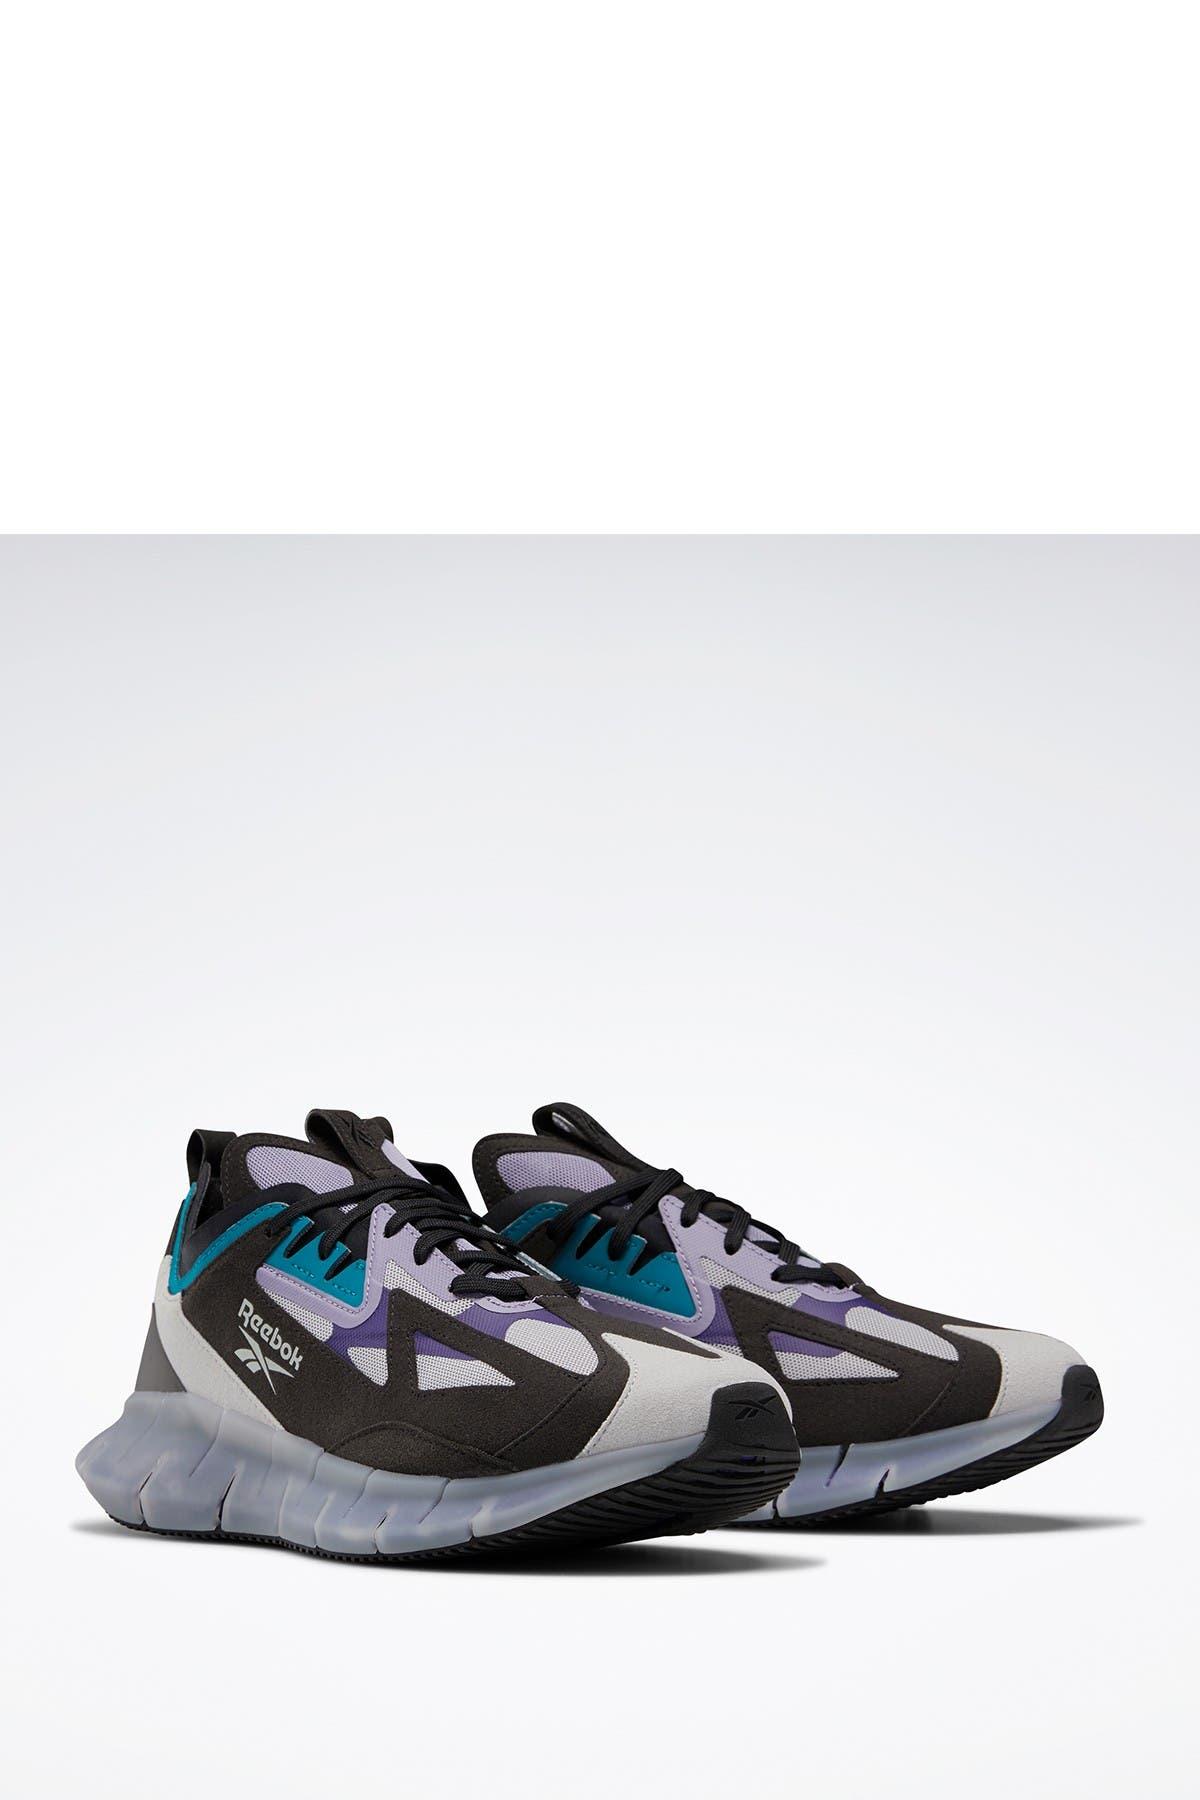 Image of Reebok Zig Kinetica Concept Type 2 Sneaker